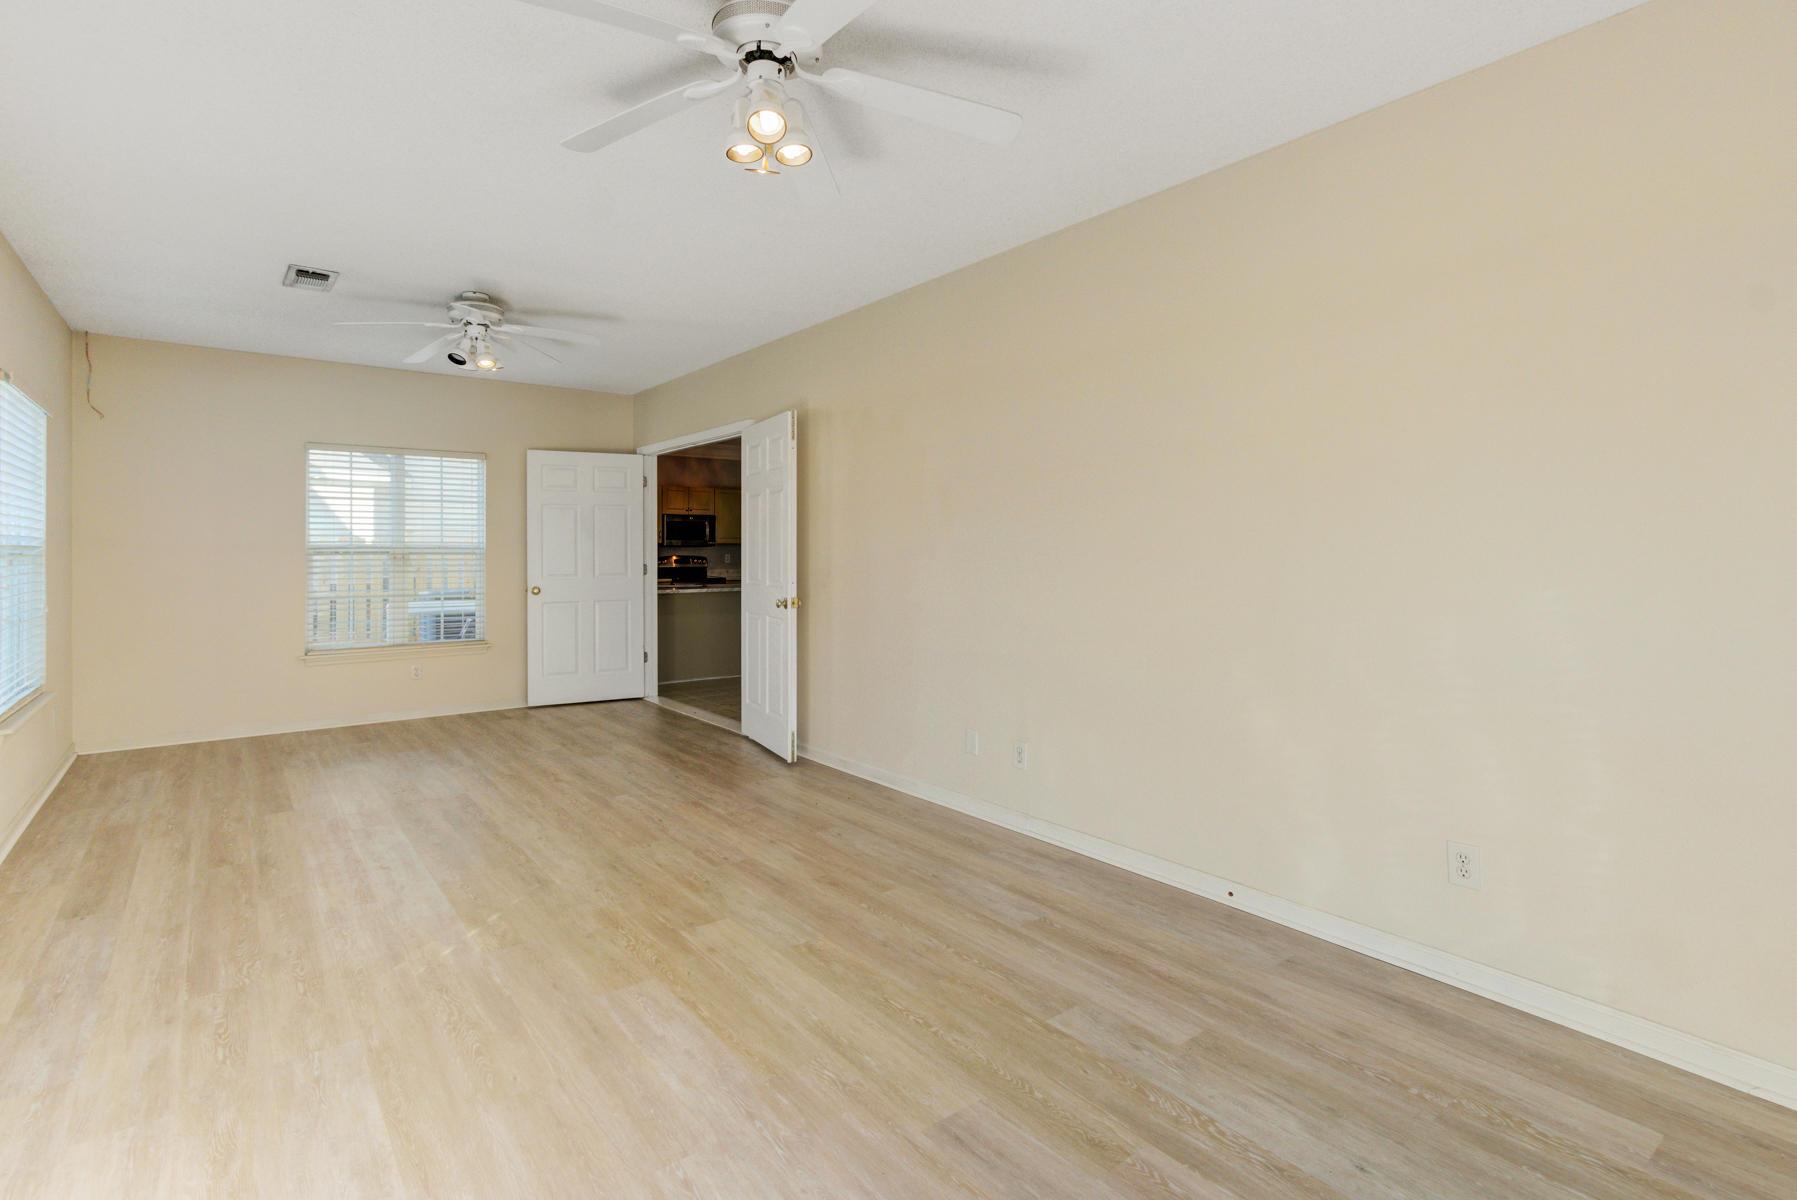 Village Green Homes For Sale - 3323 Hearthside, Charleston, SC - 8